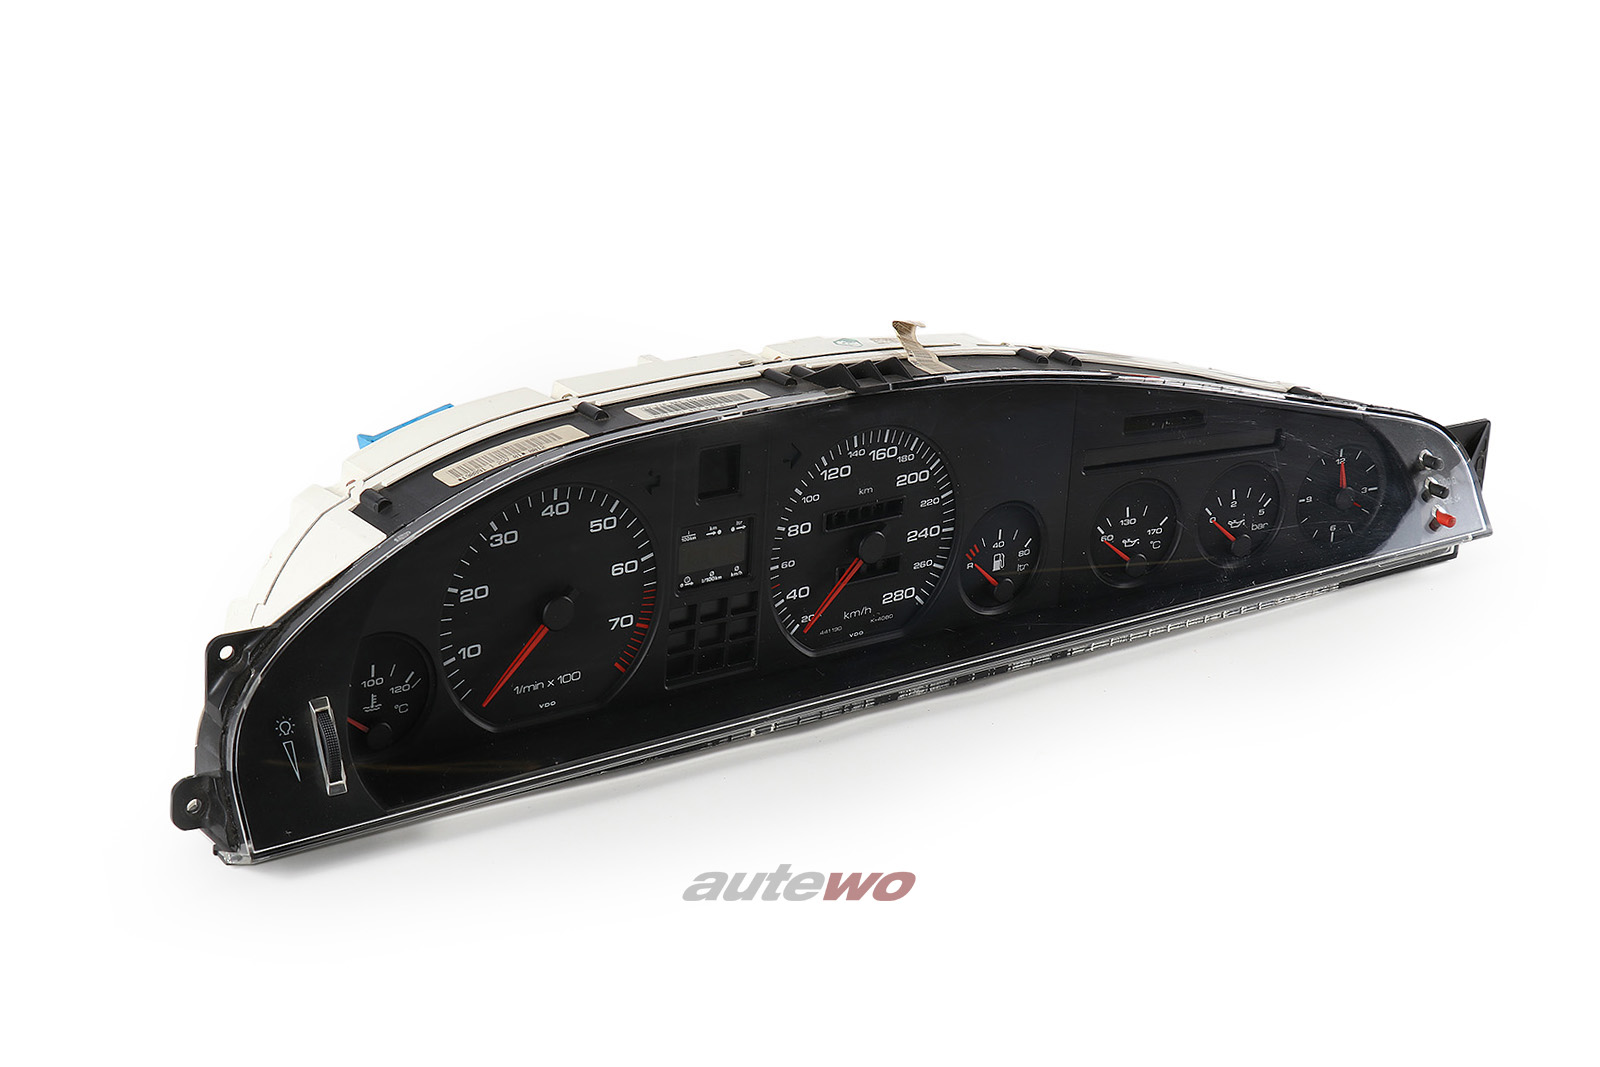 441919033BC 441919880JX Audi V8 D11 VDO Kombiinstrument 280km/h